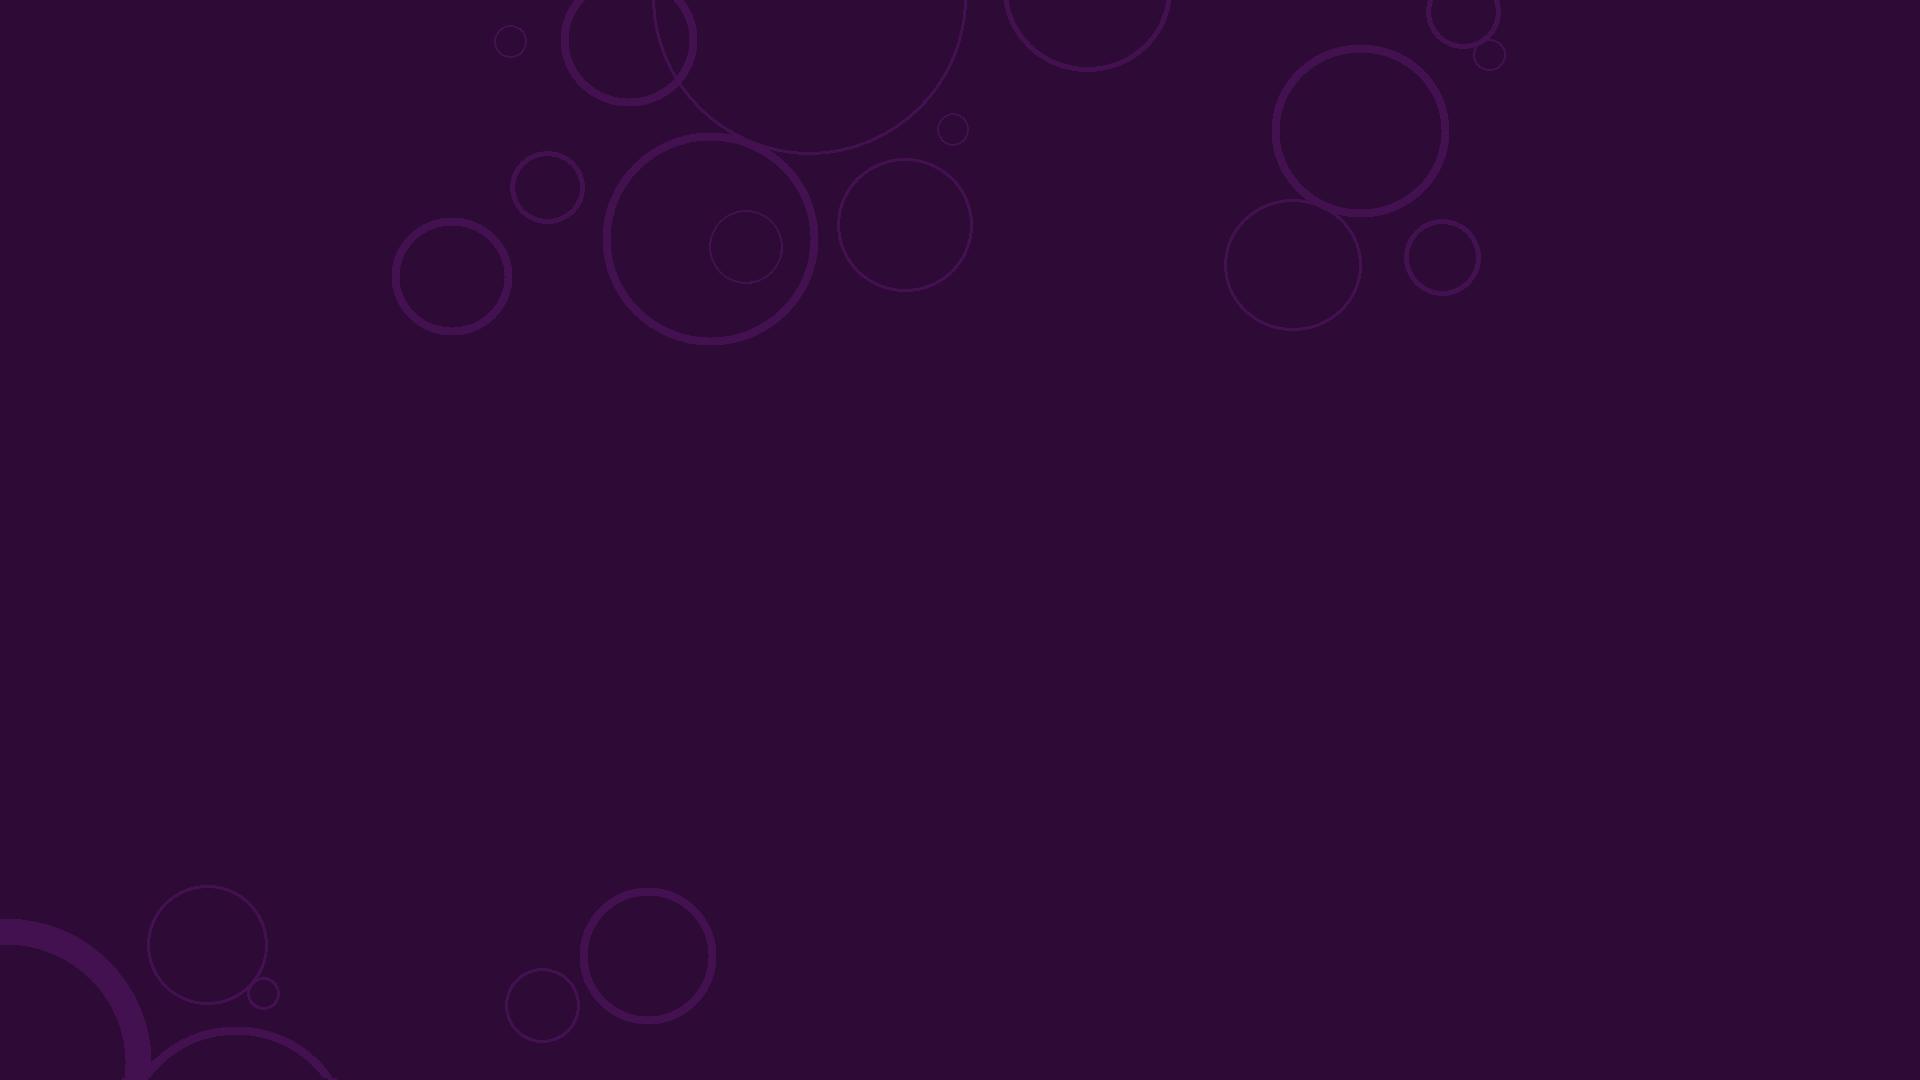 Windows 8 Official Wallpaper Purple Purple Windows 8 Bubbles